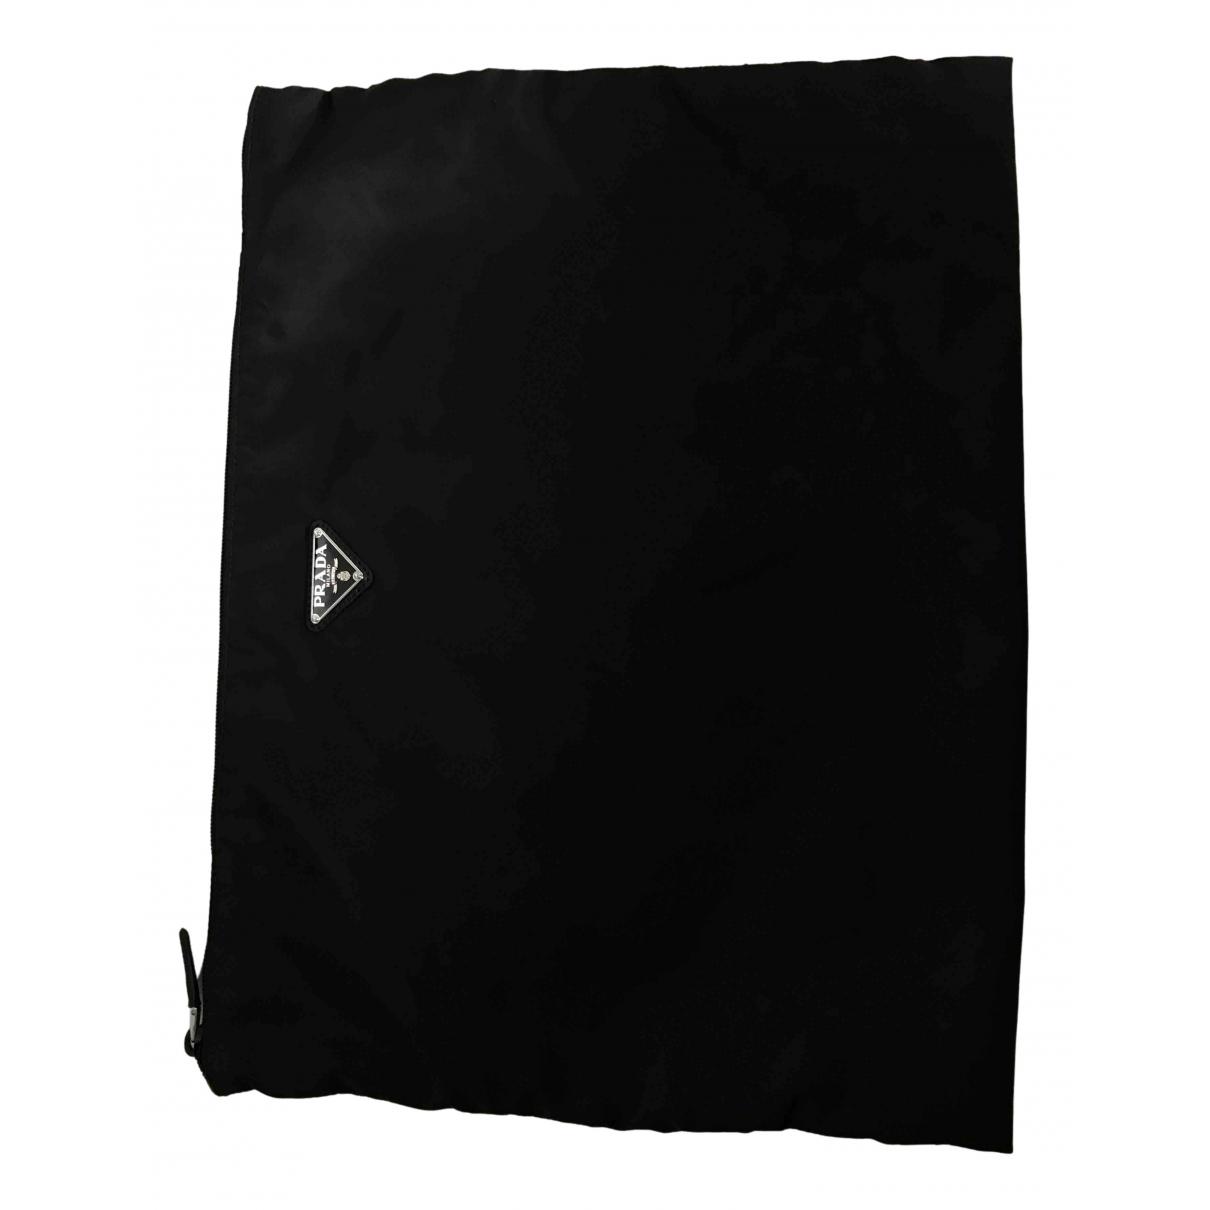 Prada \N Kleinlederwaren in  Schwarz Polyester